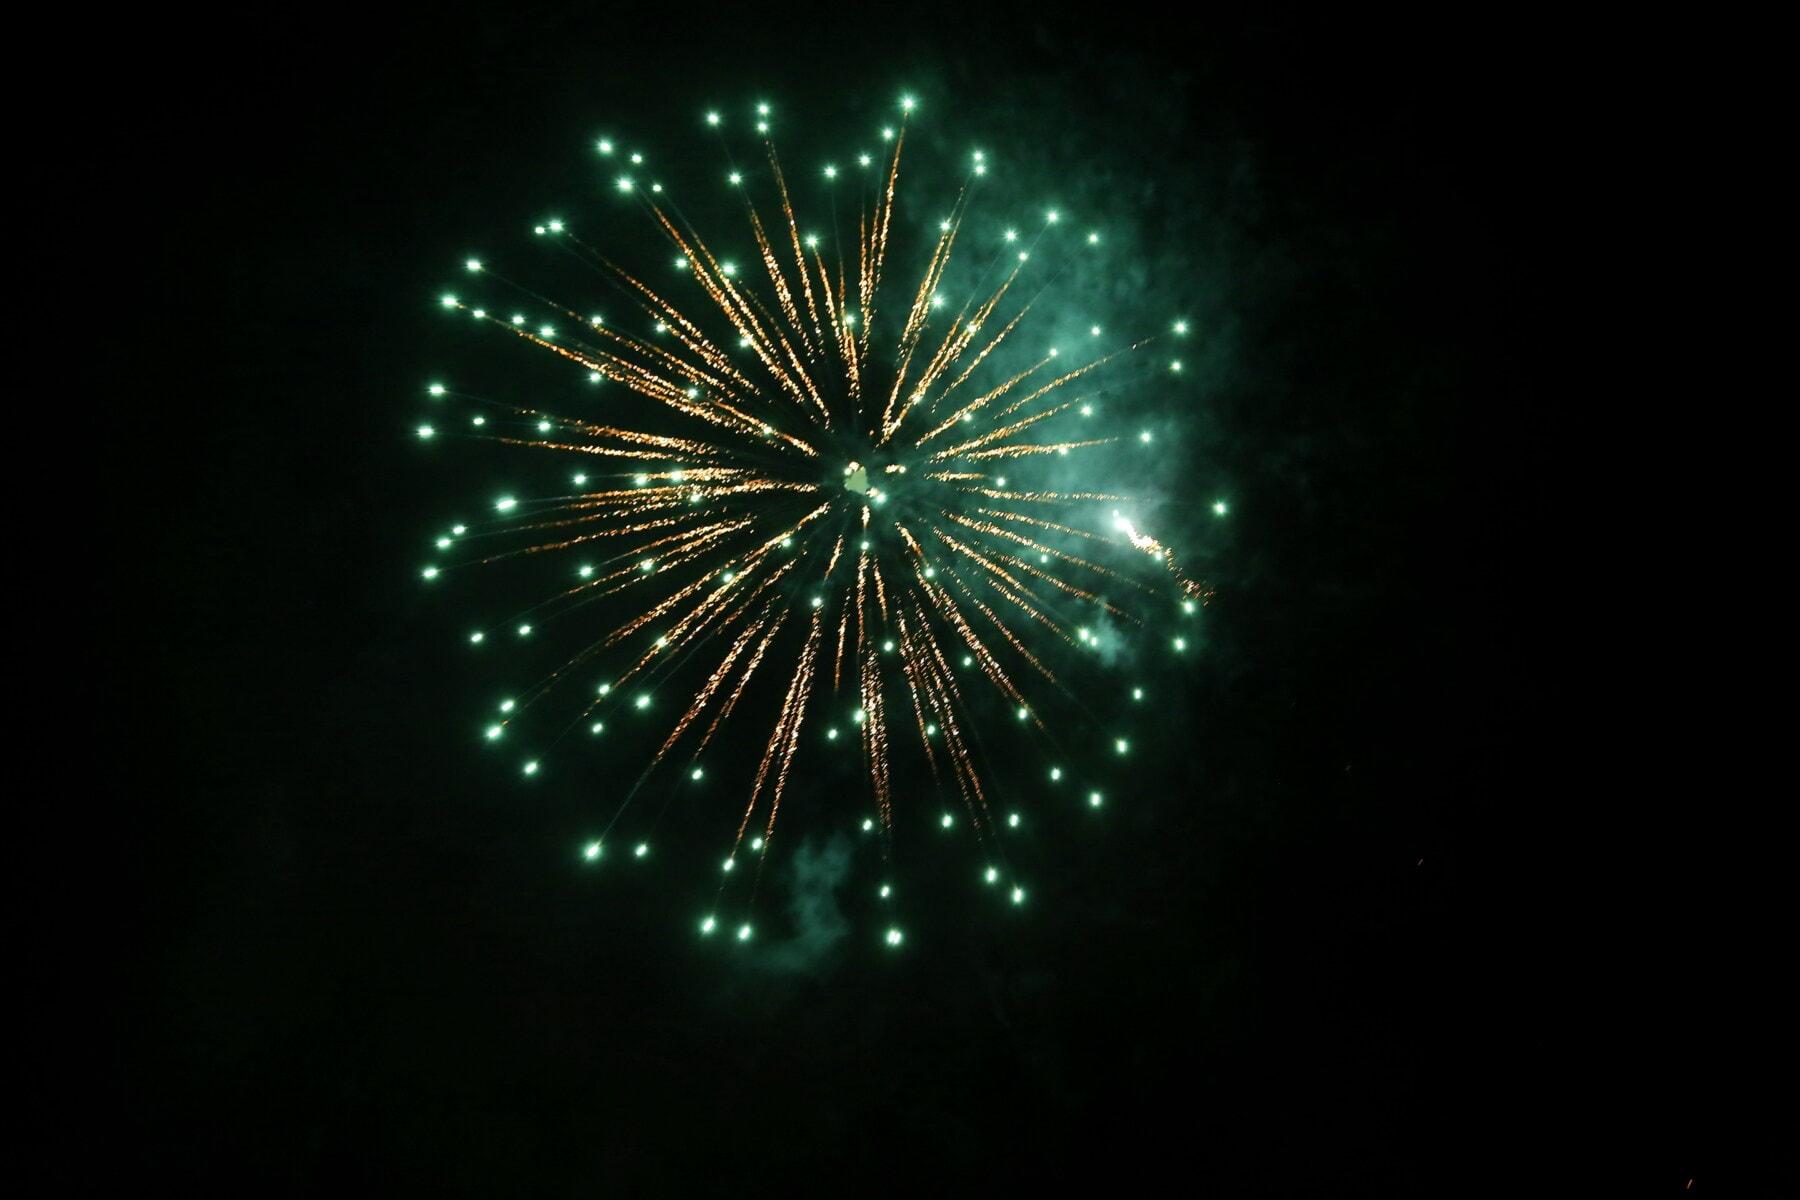 нова година, фойерверки, Искра, през нощта, нощ, зелена светлина, фестивал, празник, фойерверки, експлозия